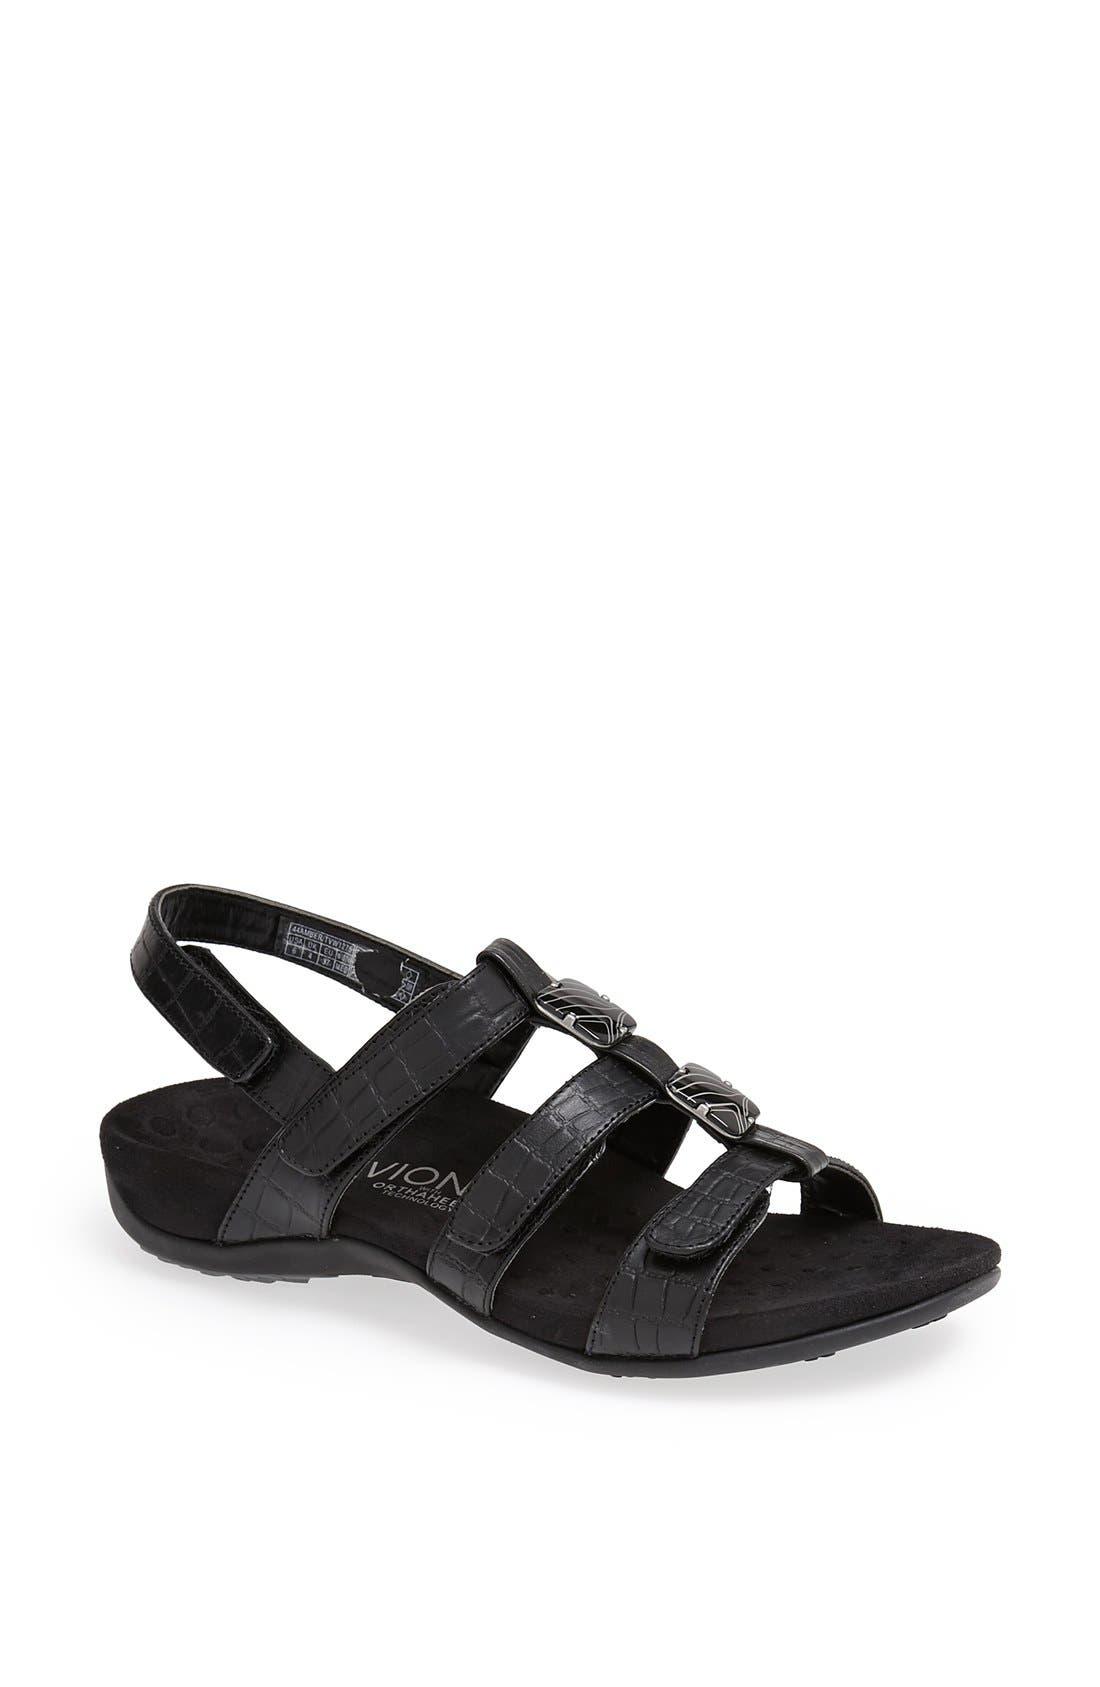 Vionic with Orthaheel® 'Amber' Adjustable Sandal